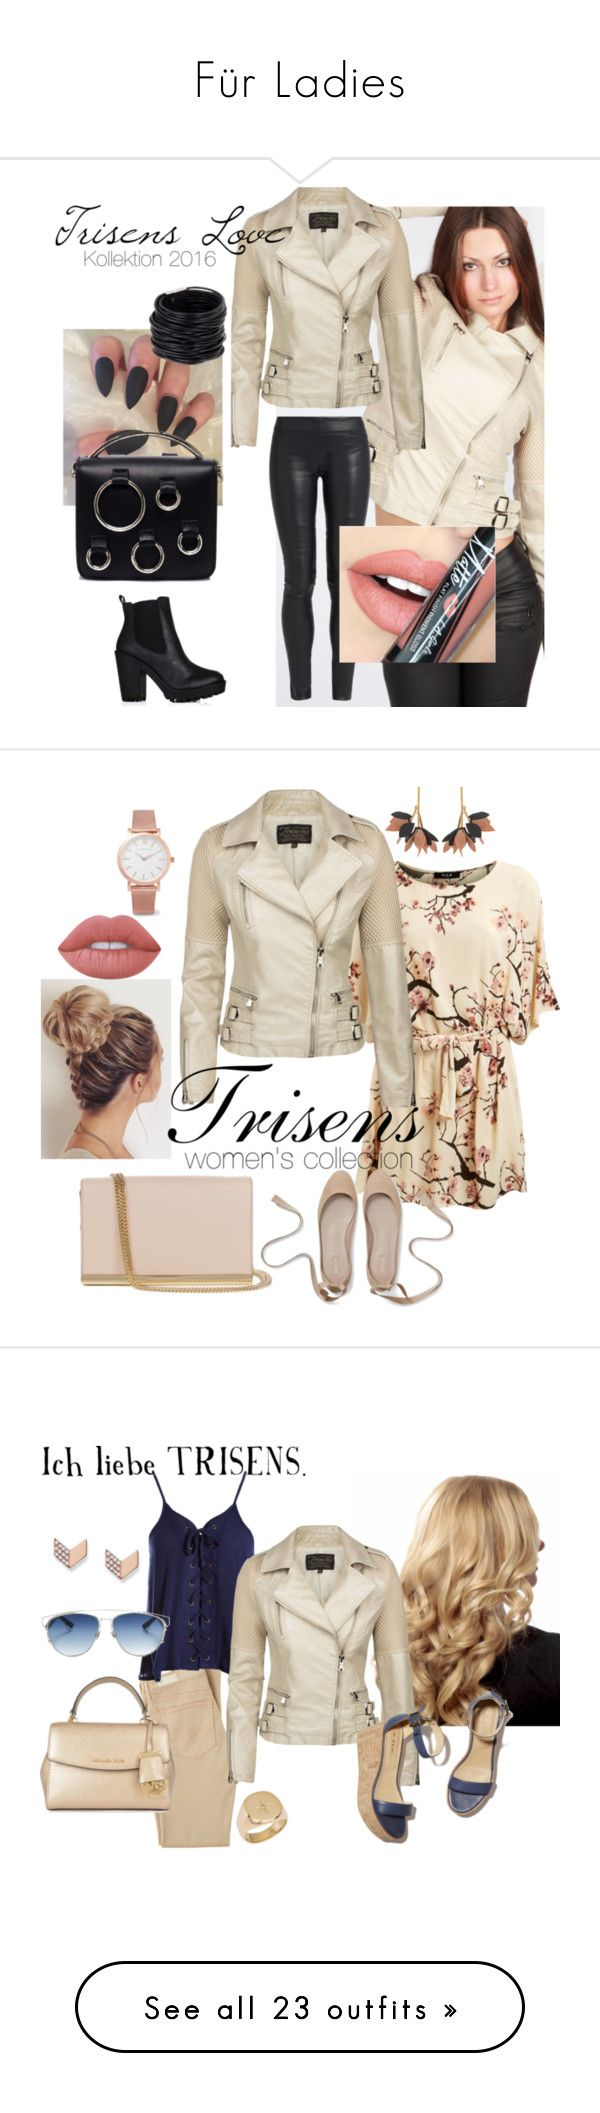 """Für Ladies"" by trisens on Polyvore featuring Mode, Lipsy und Panacea"